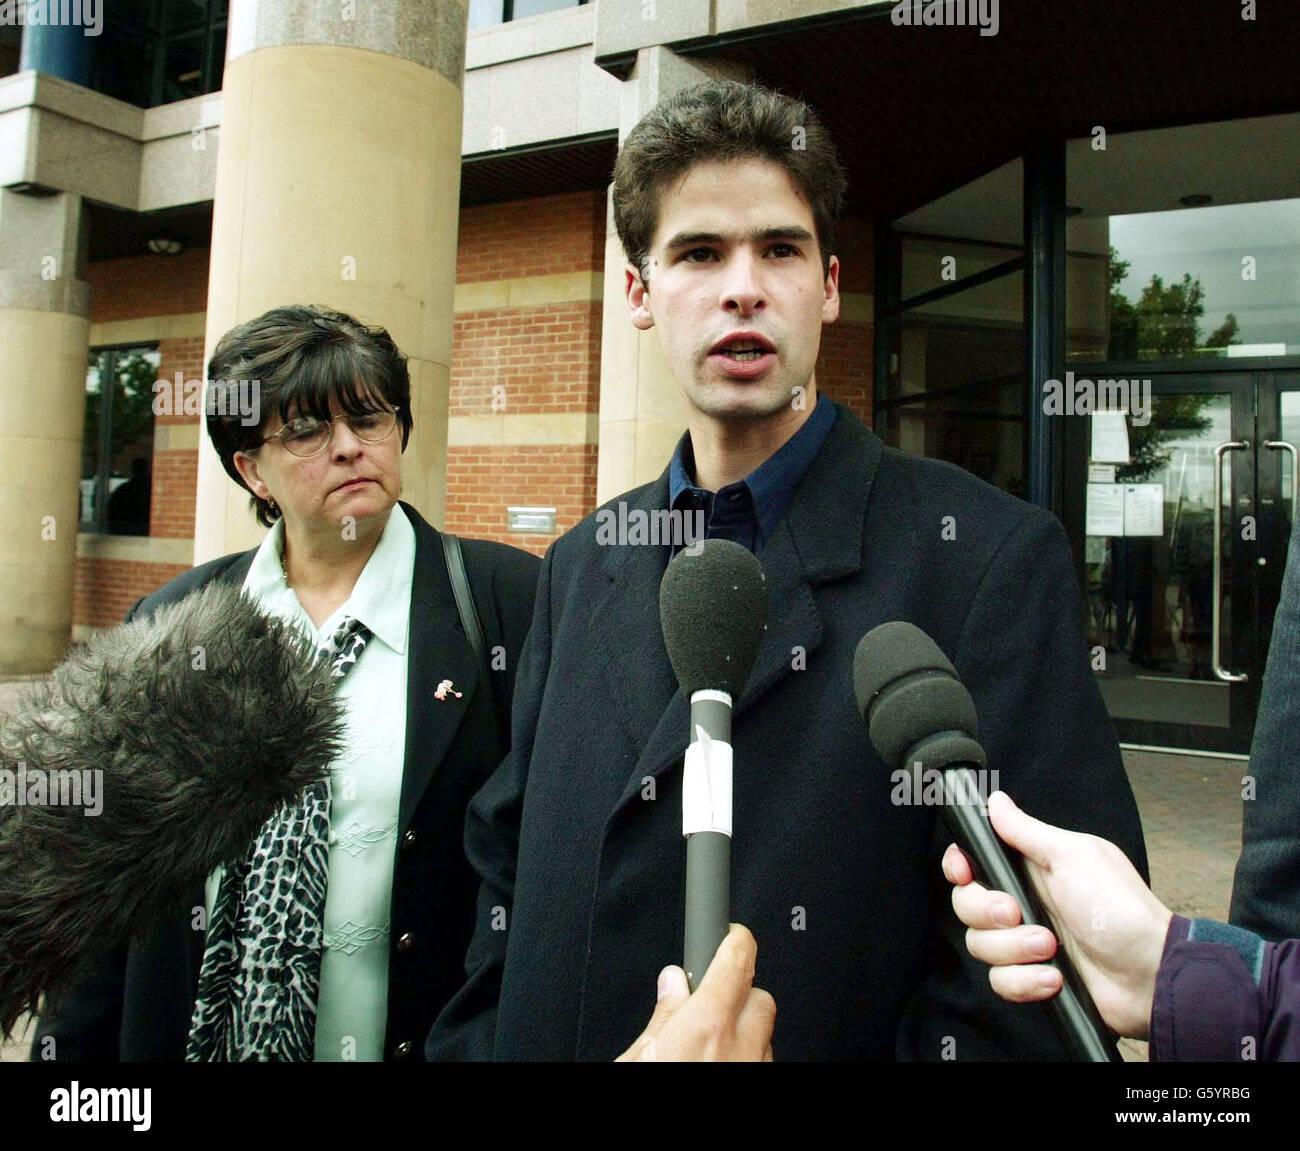 Jamie Bright - Bully victim - Stock Image